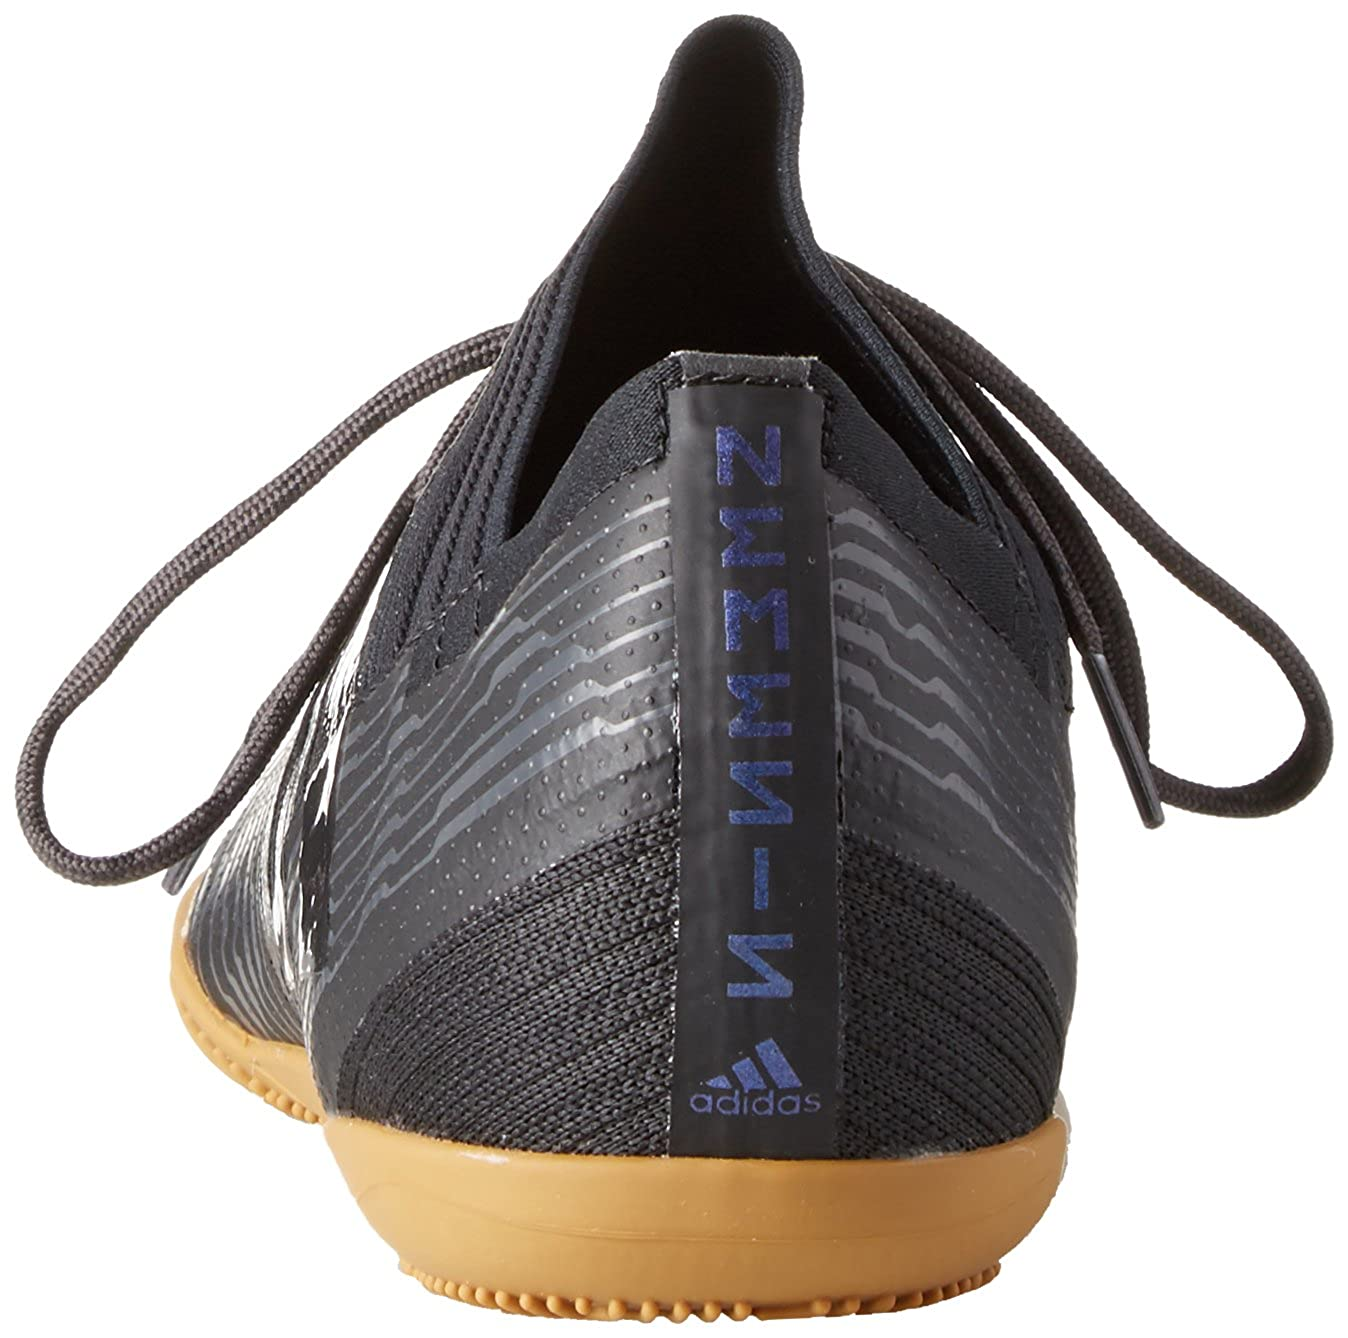 Adidas Unisex-Erwachsene Nemeziz Nemeziz Nemeziz Tango 17.3 Bb3654 Turnschuhe 687ac3